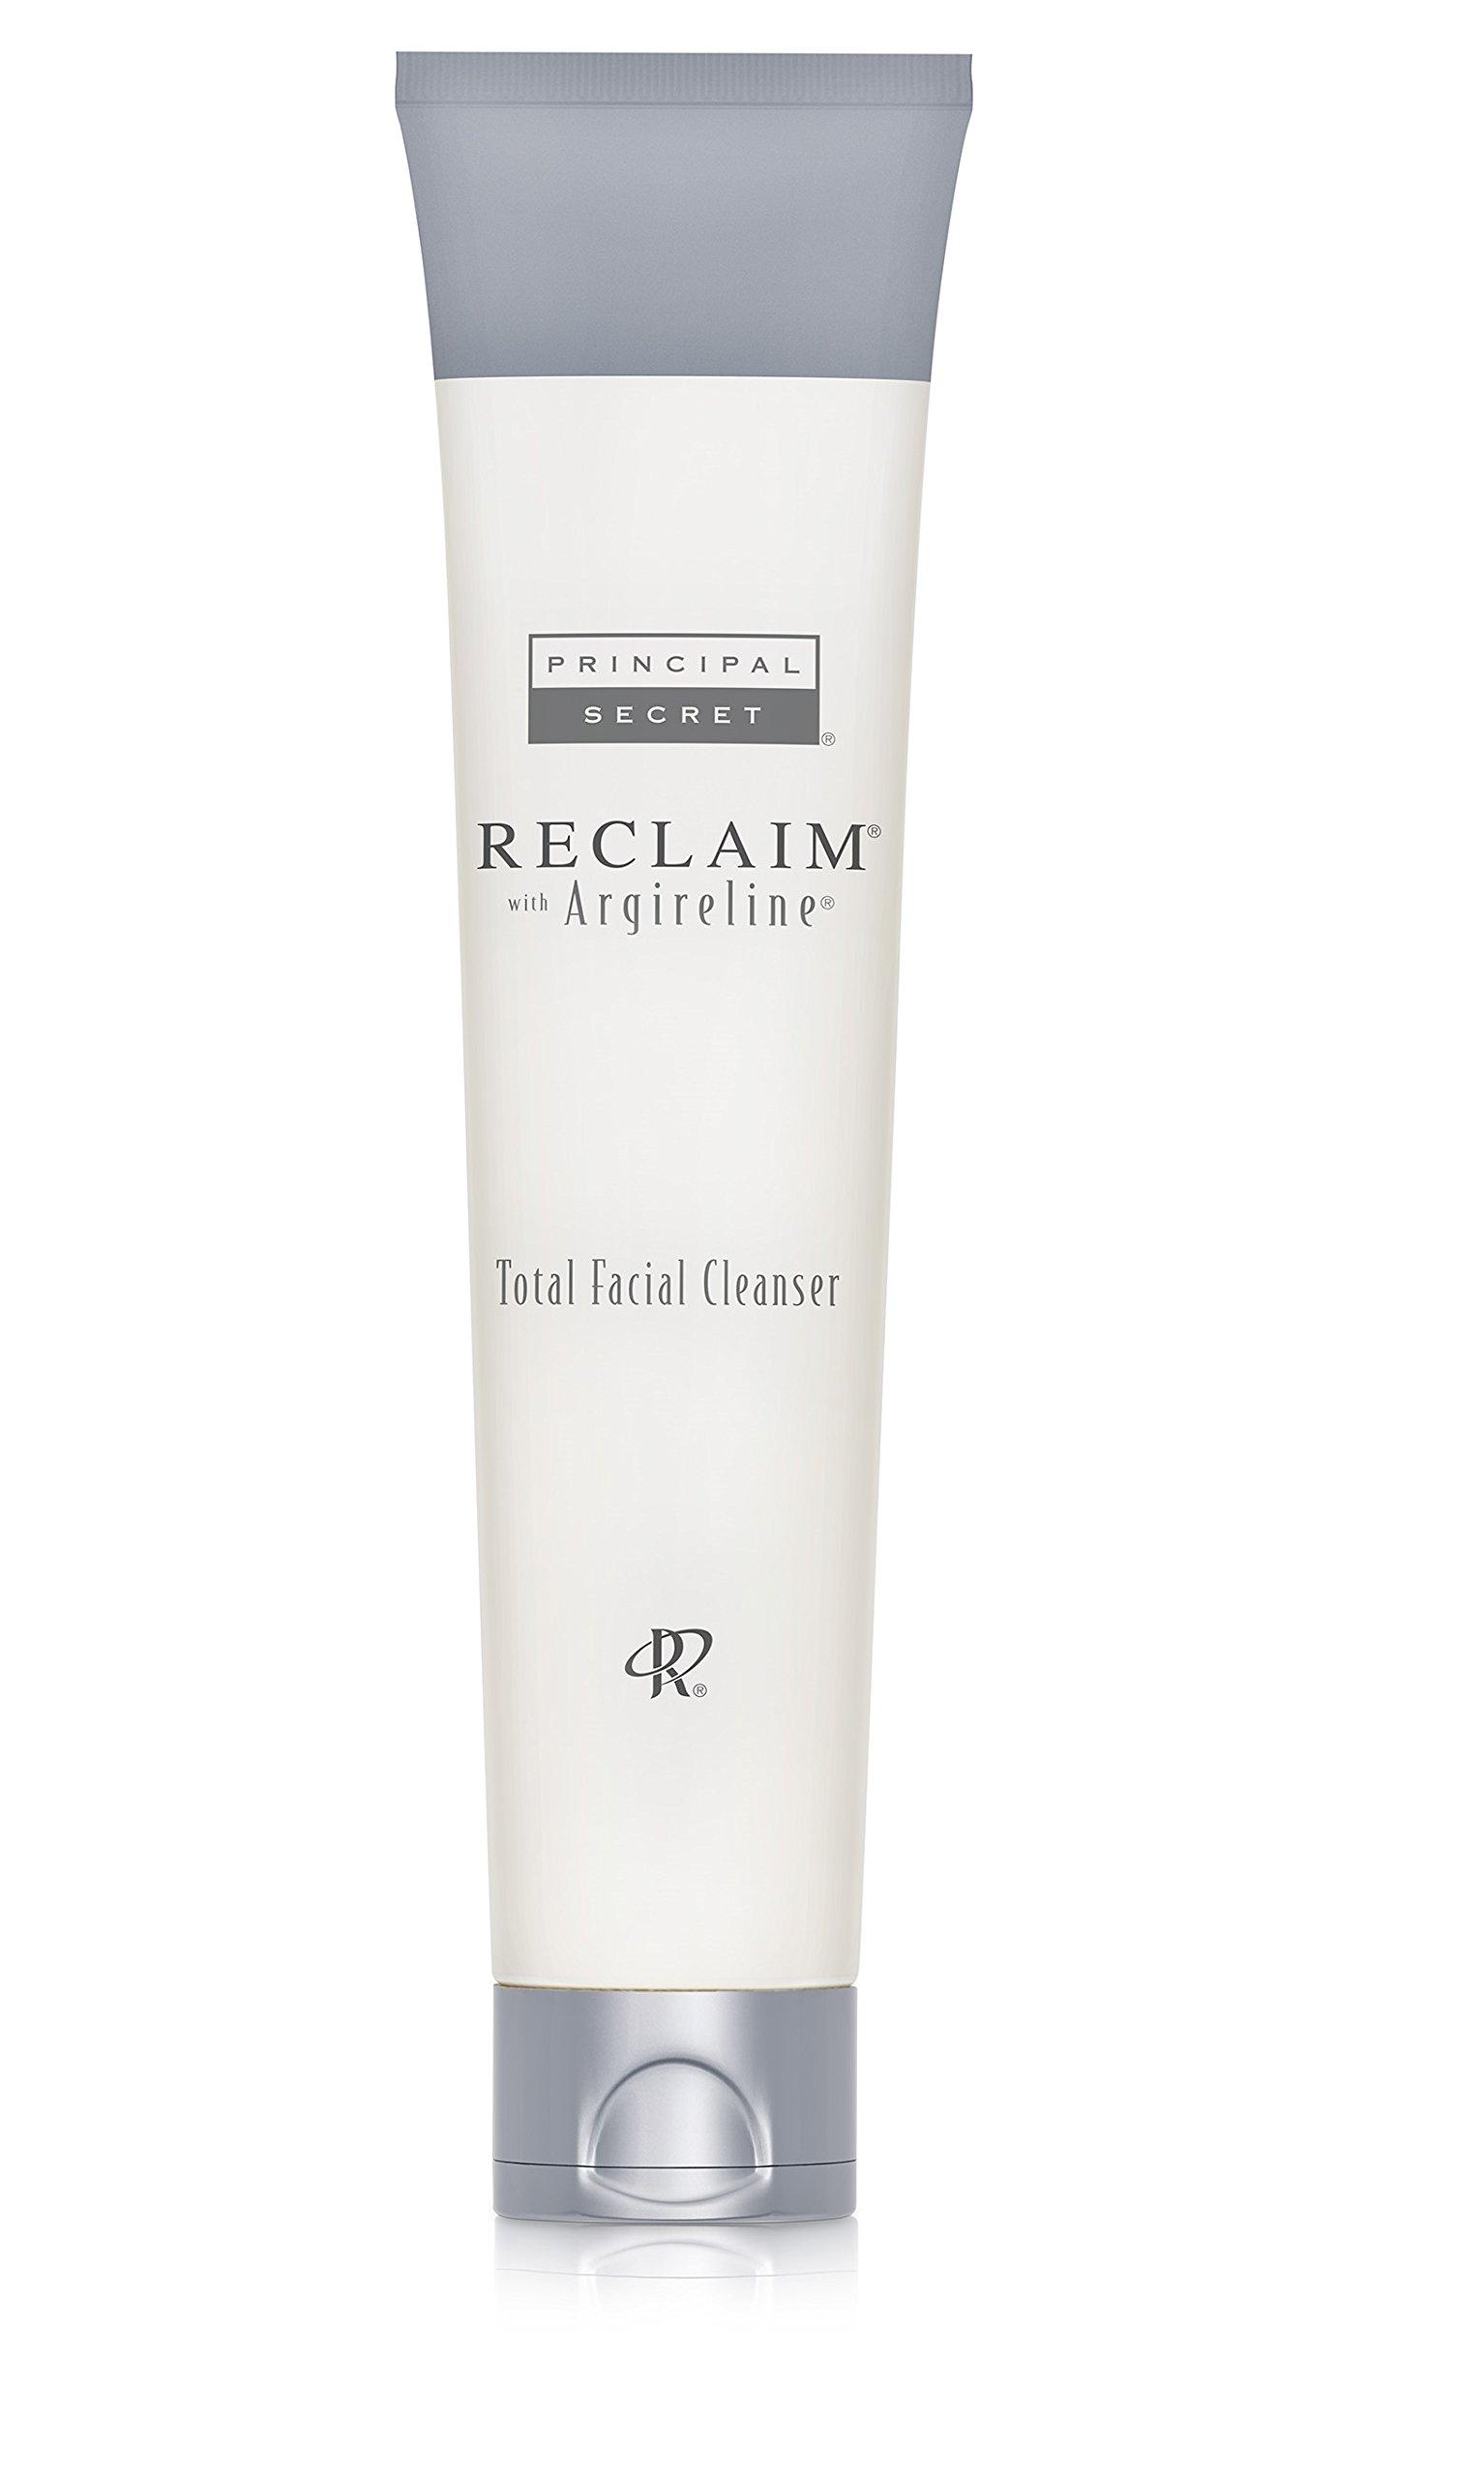 Principal Secret – Reclaim with Argireline – Total Facial Cleanser – 90 Day Supply/6 Ounces